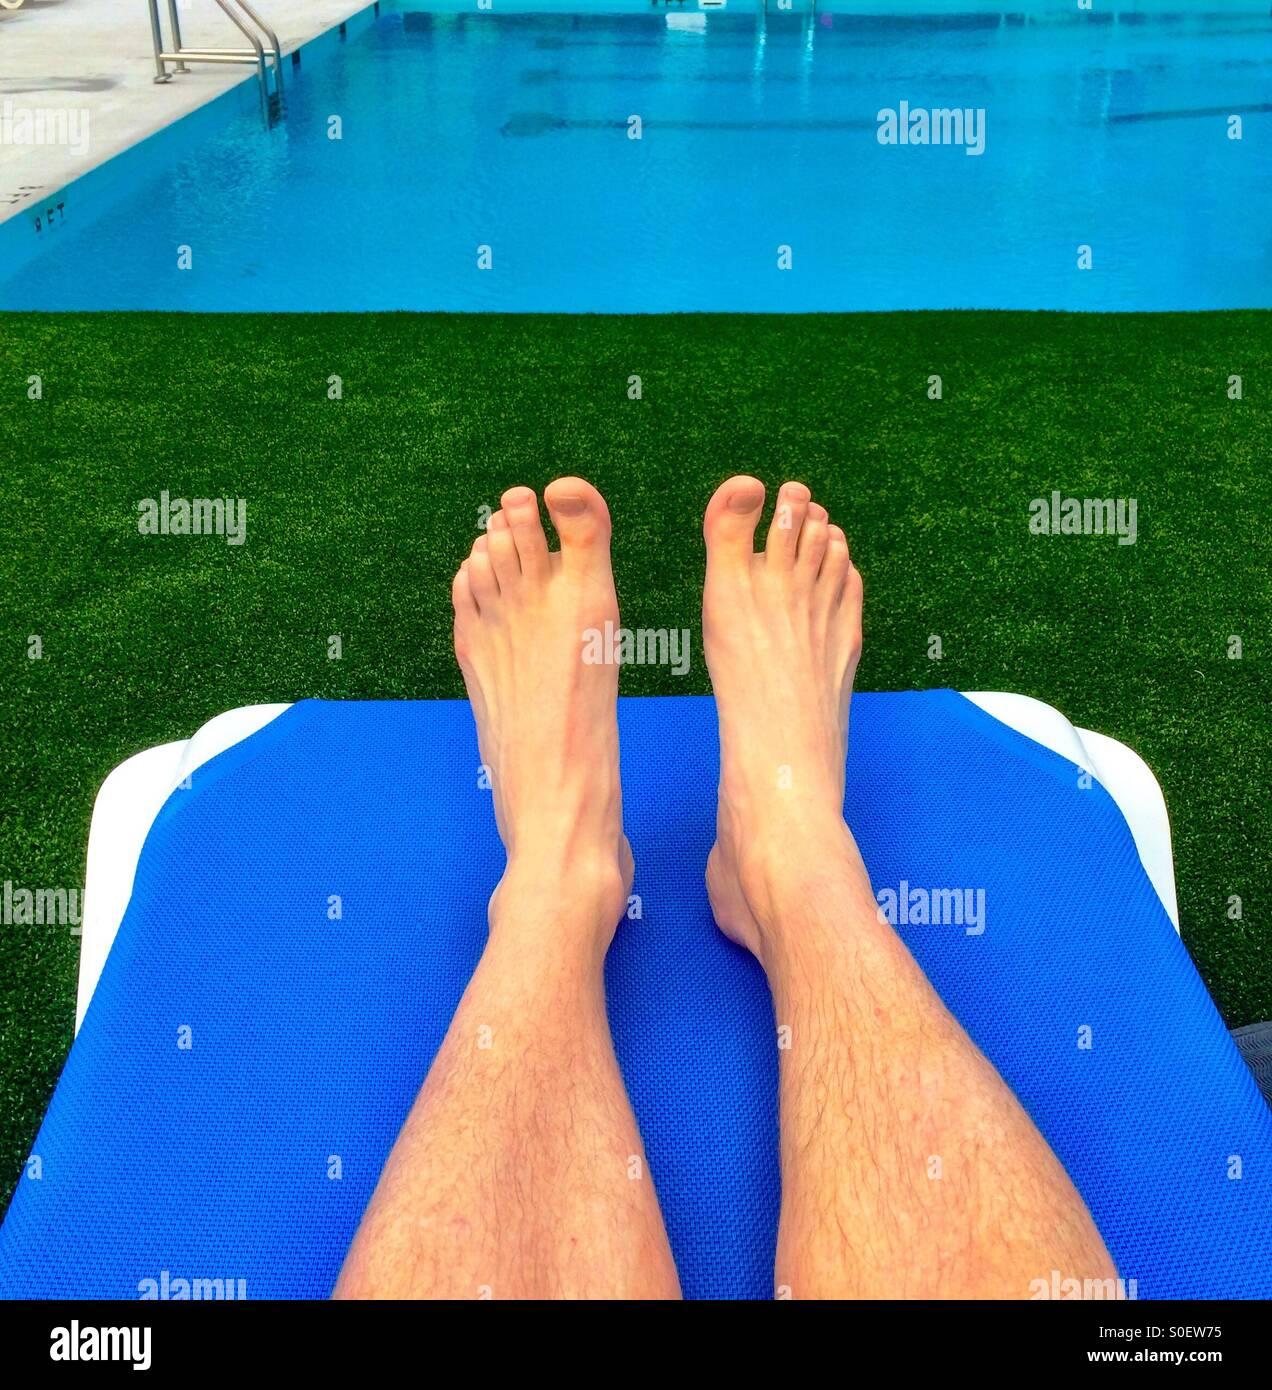 Feet and pool - Stock Image